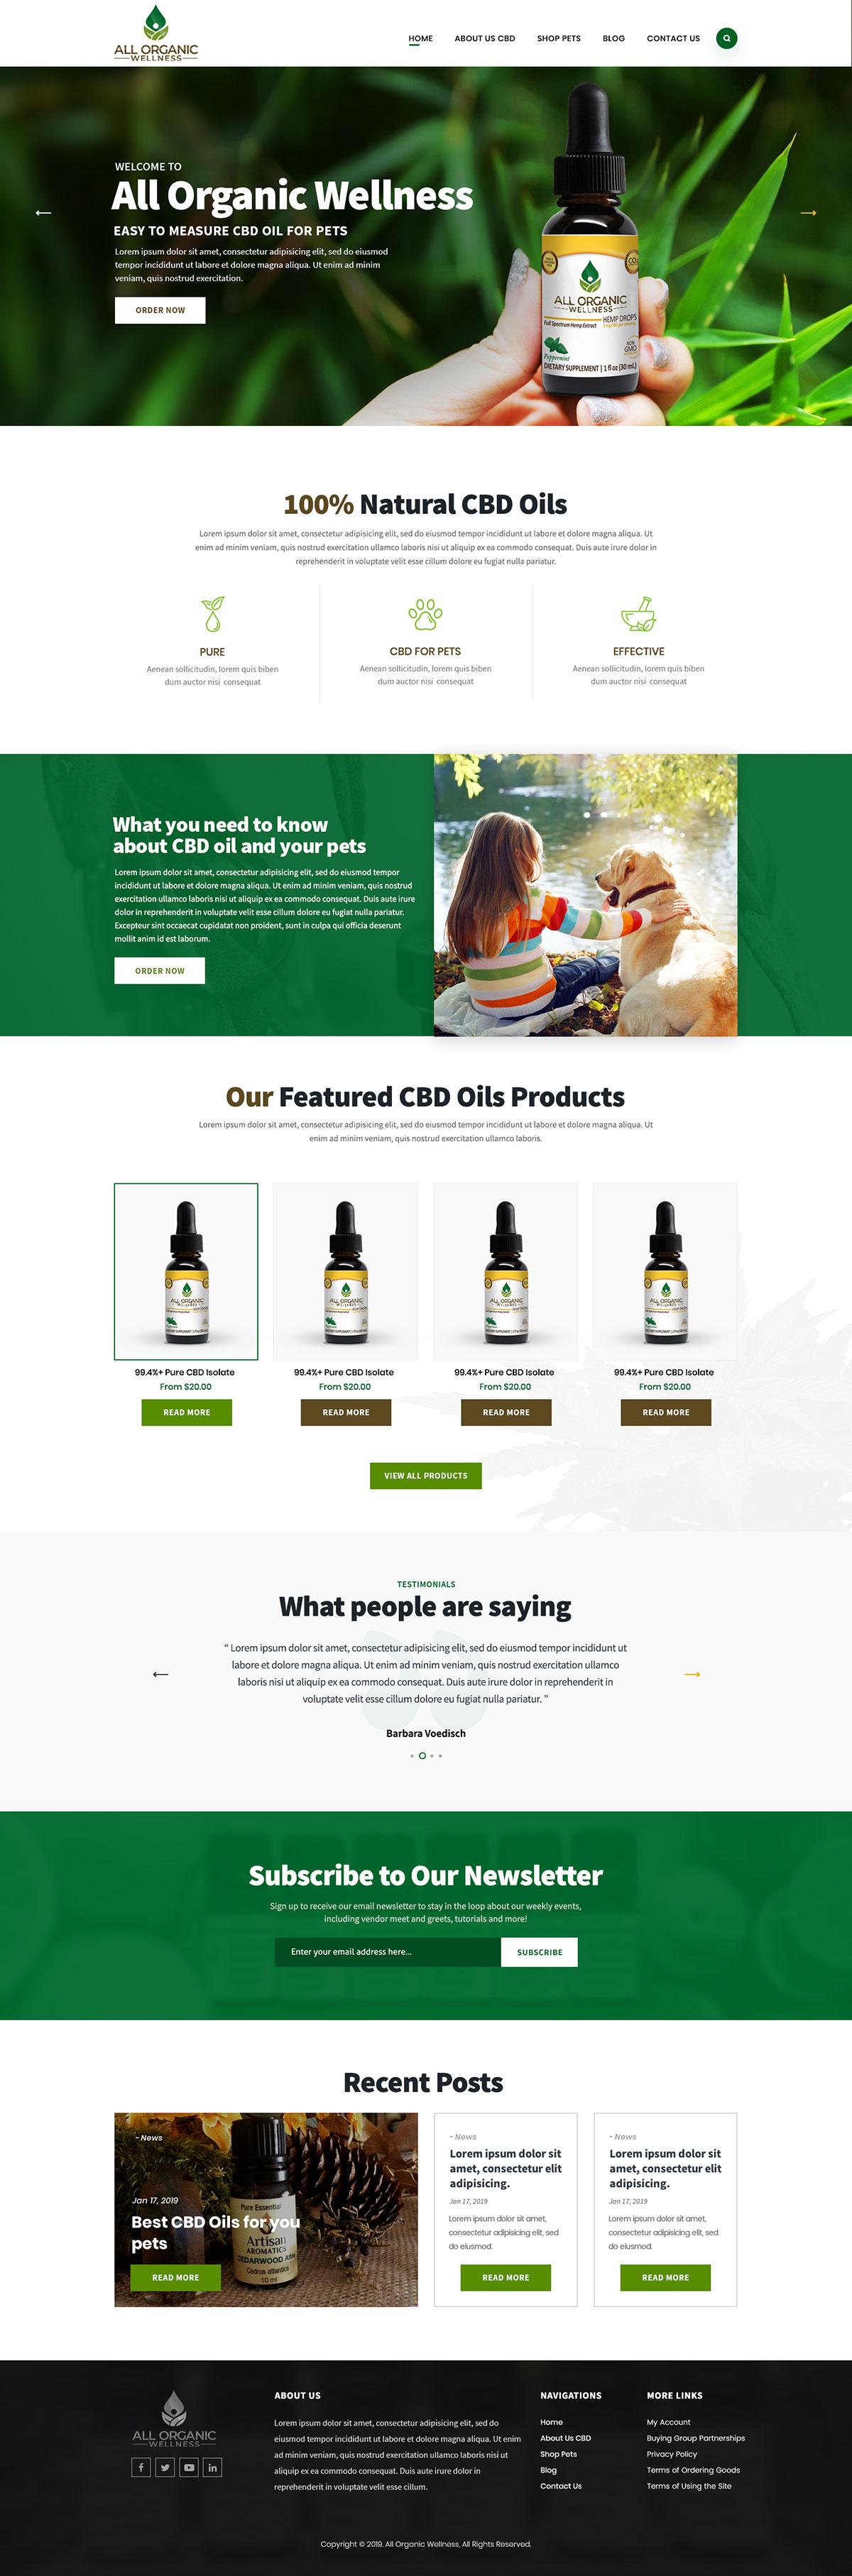 Website Motix Affordable Custom Logo Design Service In London Uk